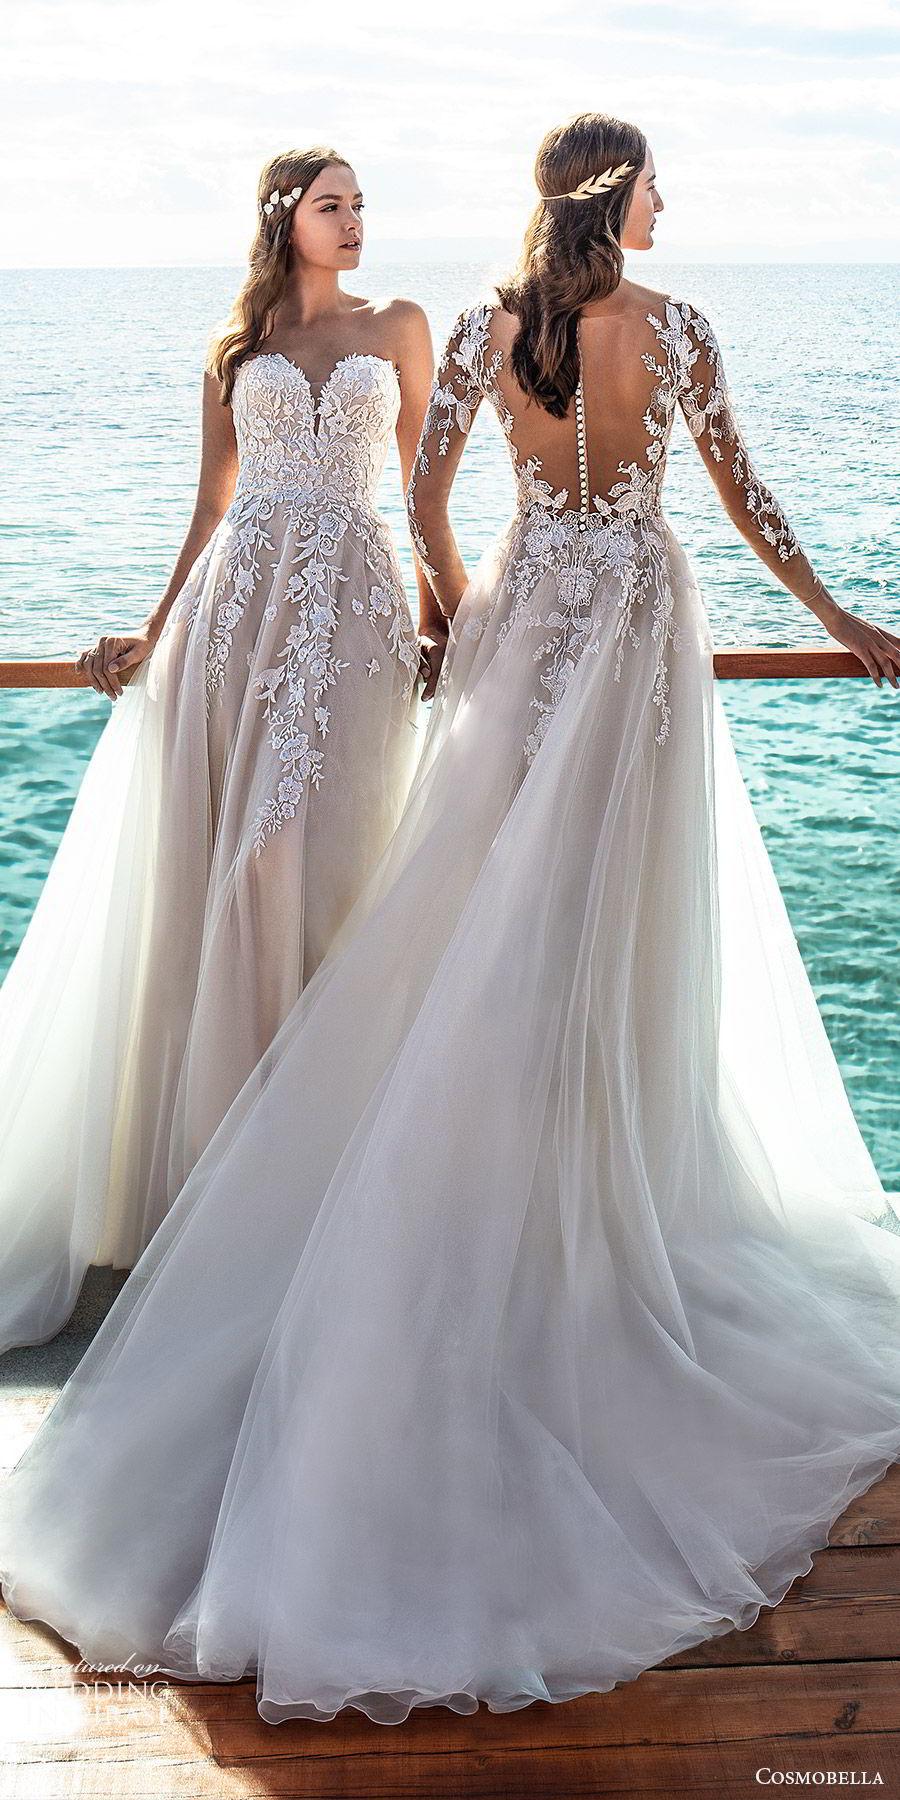 cosmobella 2020 bridal illusion long sleeves sheer bateau neck sweetheart embellished lace bodice a line ball gown wedding dress (2) elegant romantic chapel train mv